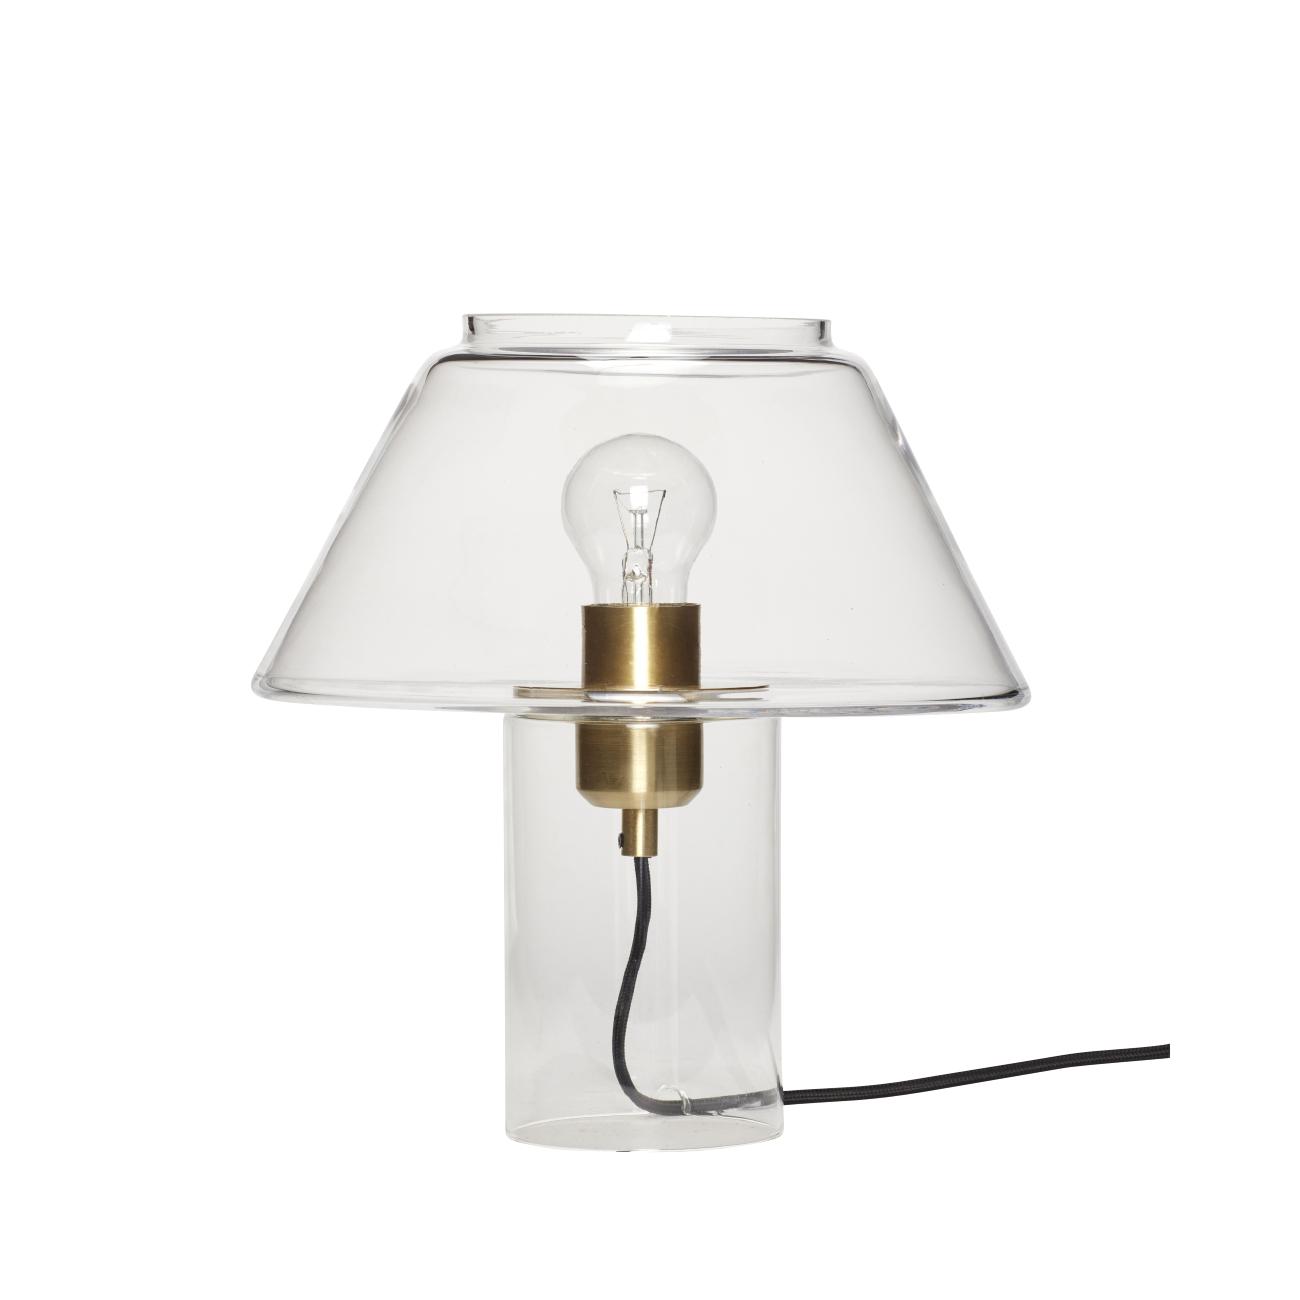 Hubsch bordslampa glas